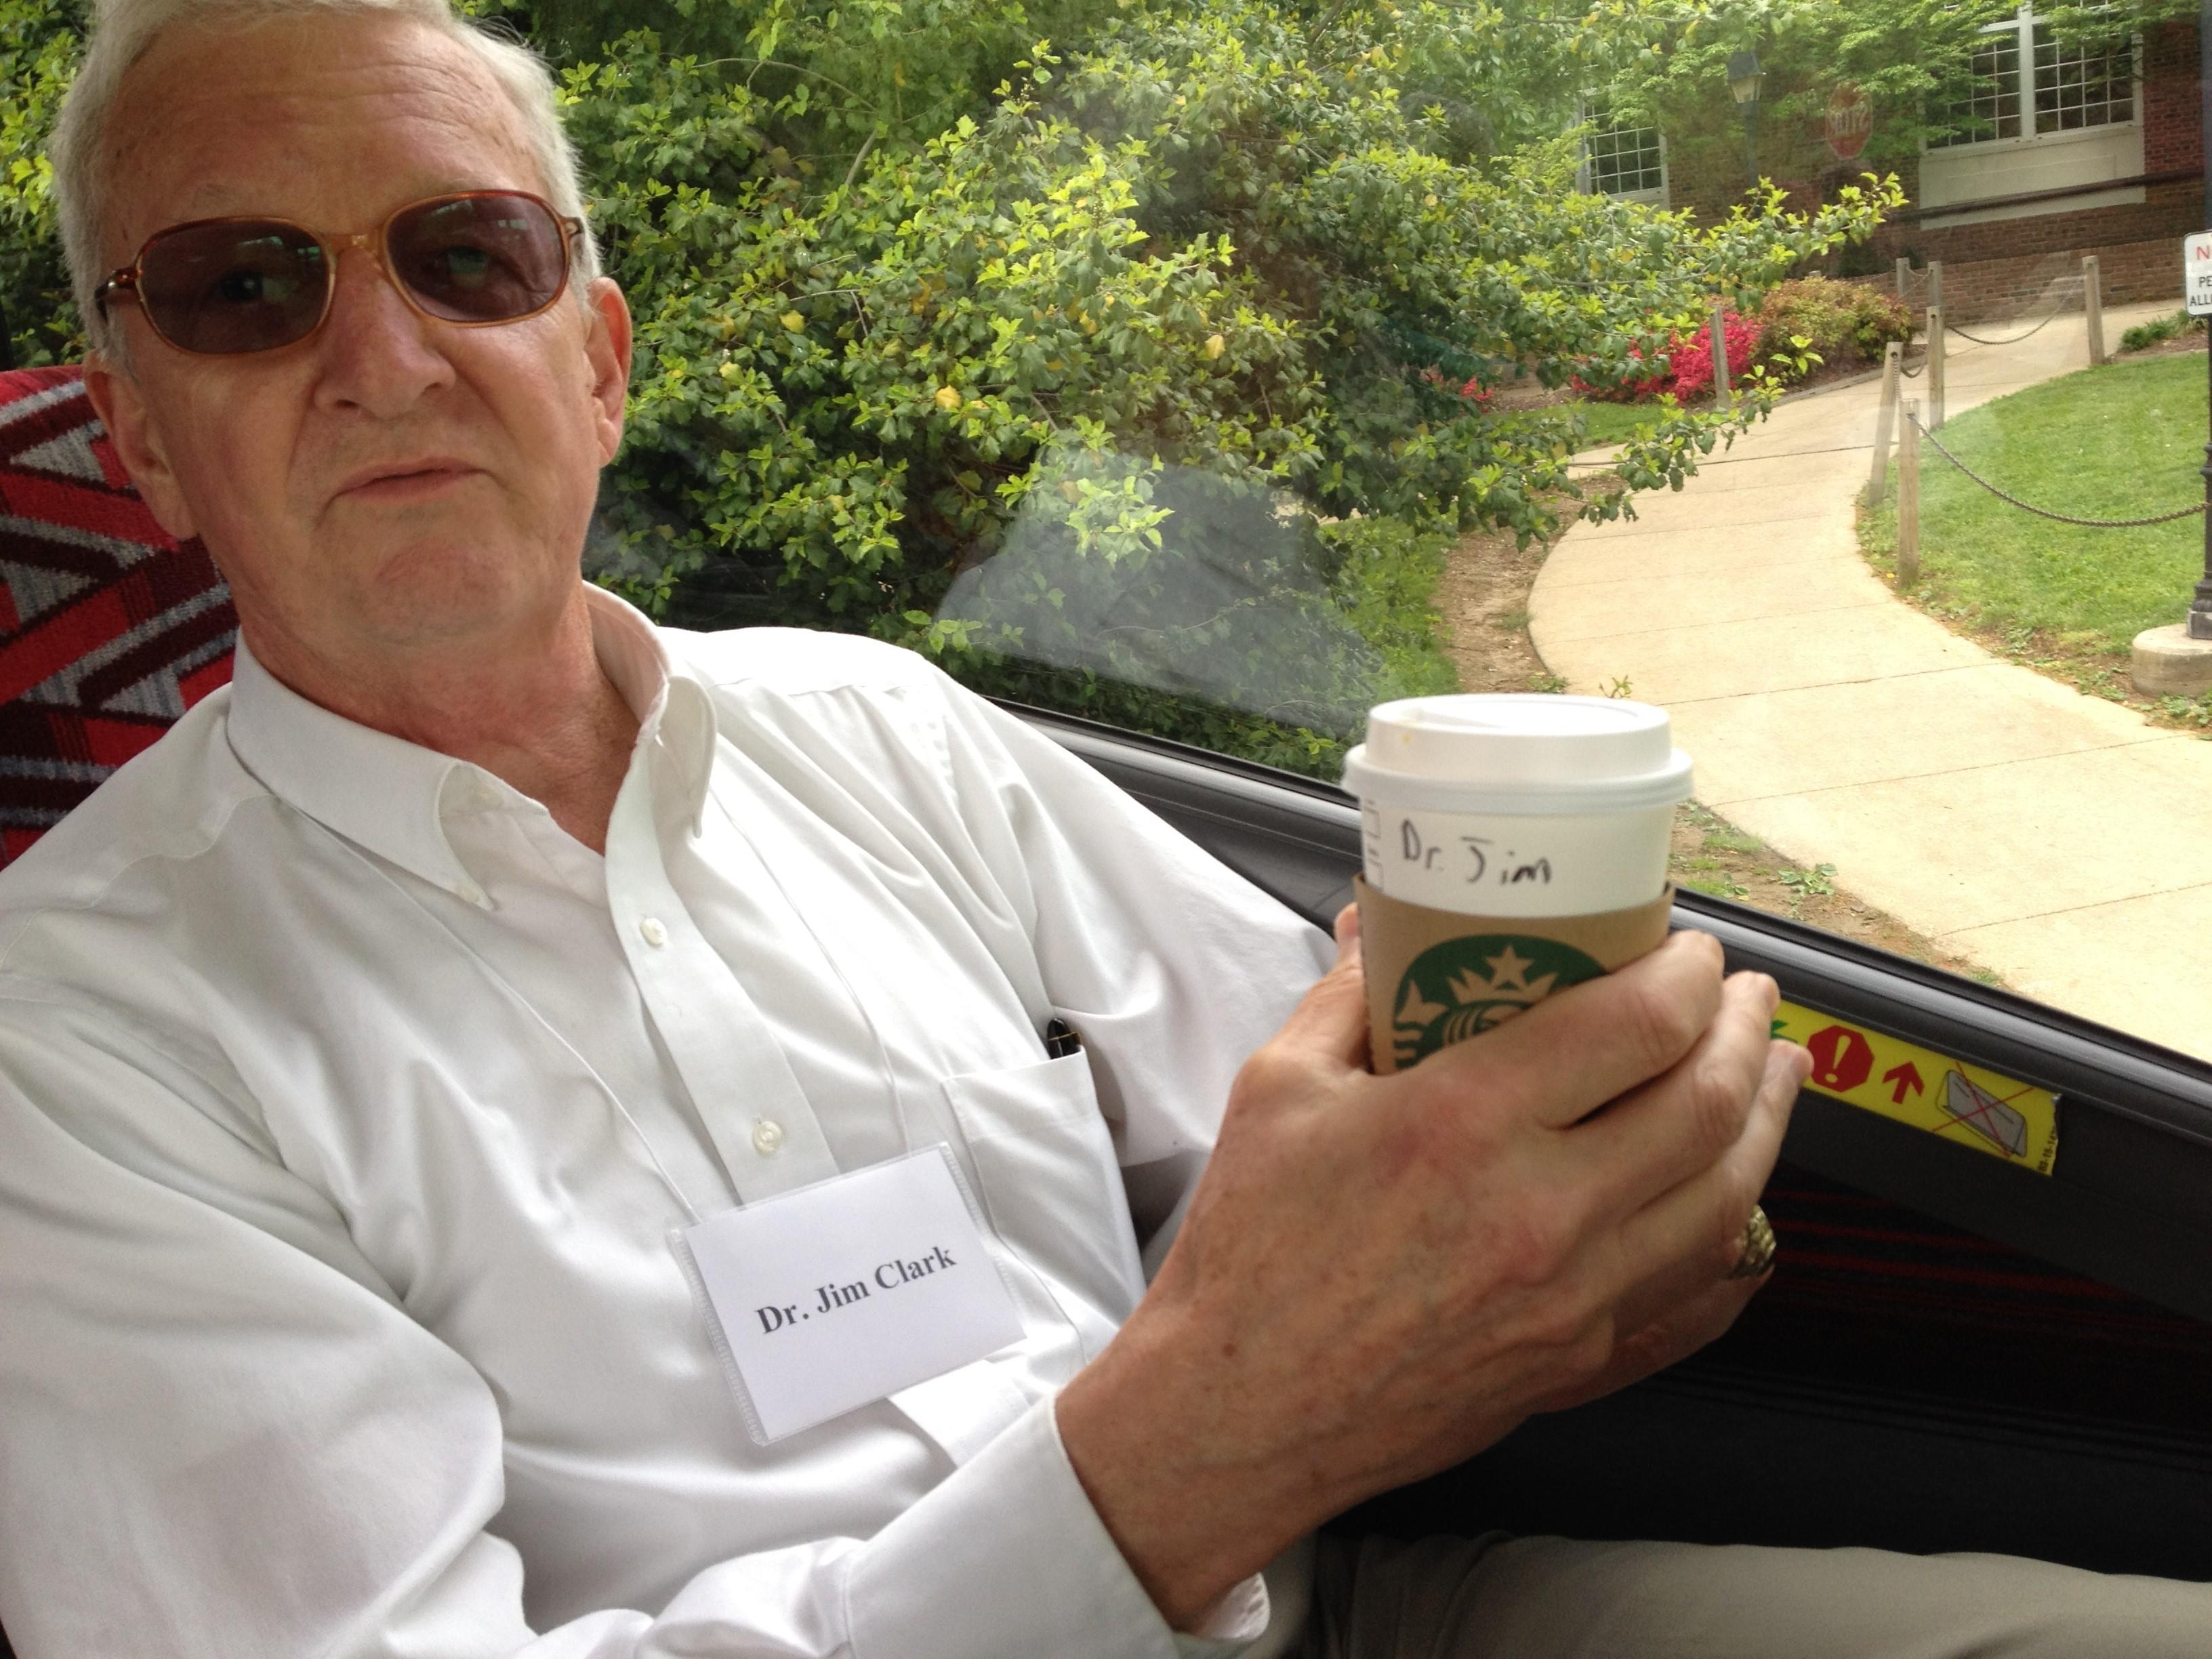 Dr Jim Coffee Cup